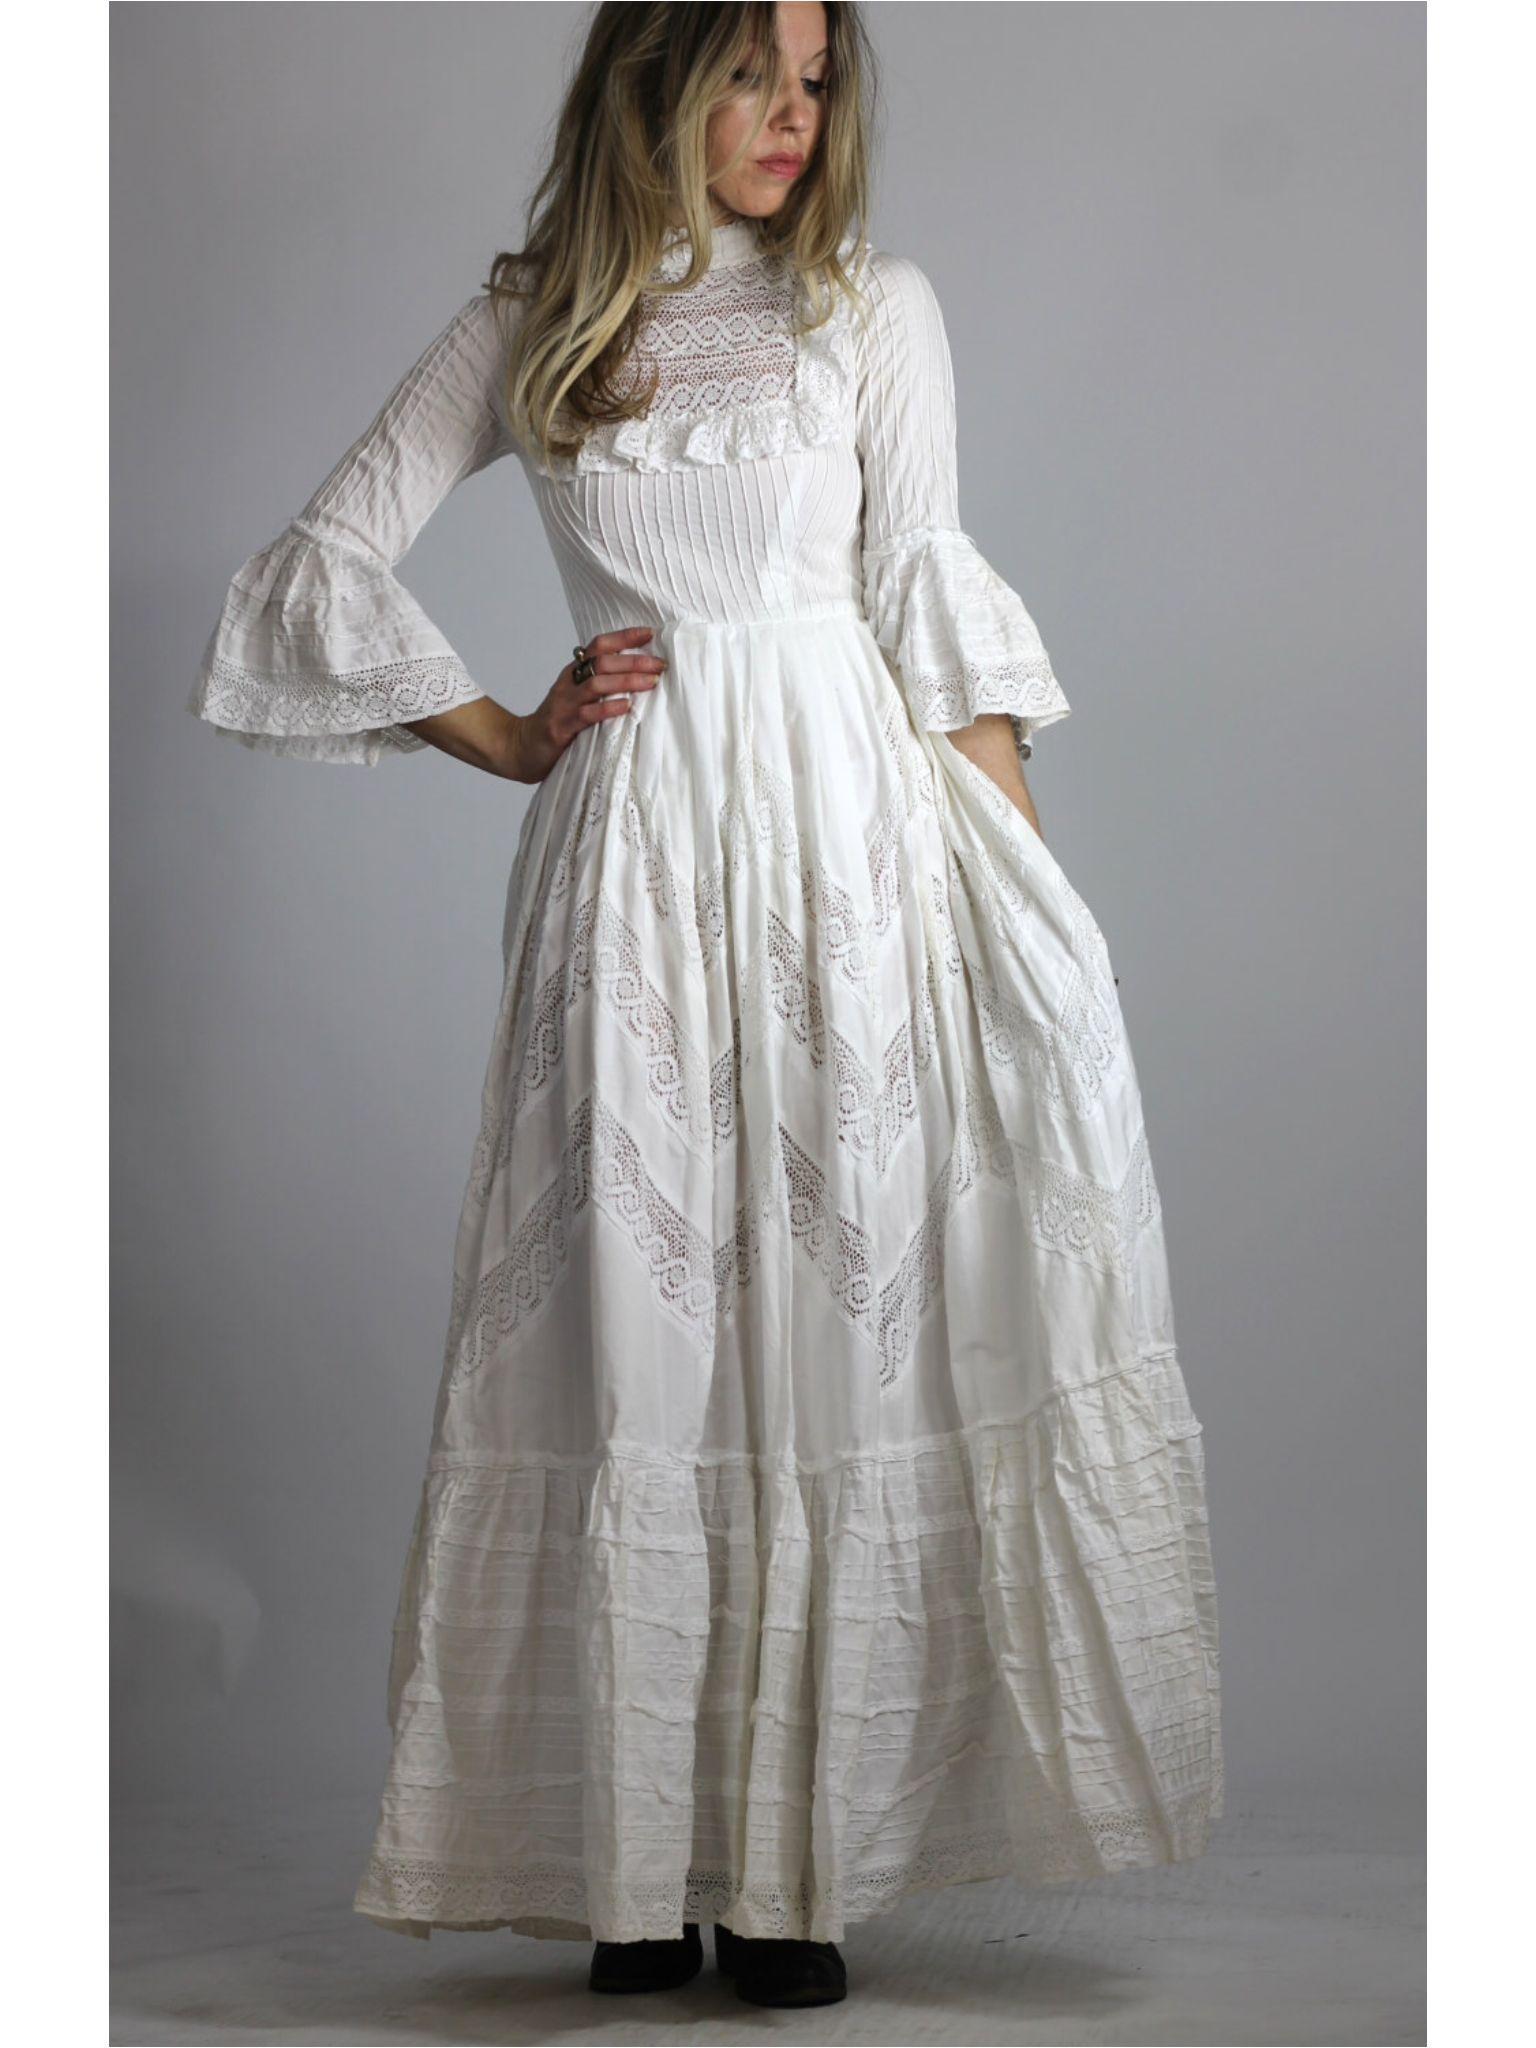 Love the dress boho chic pinterest boho